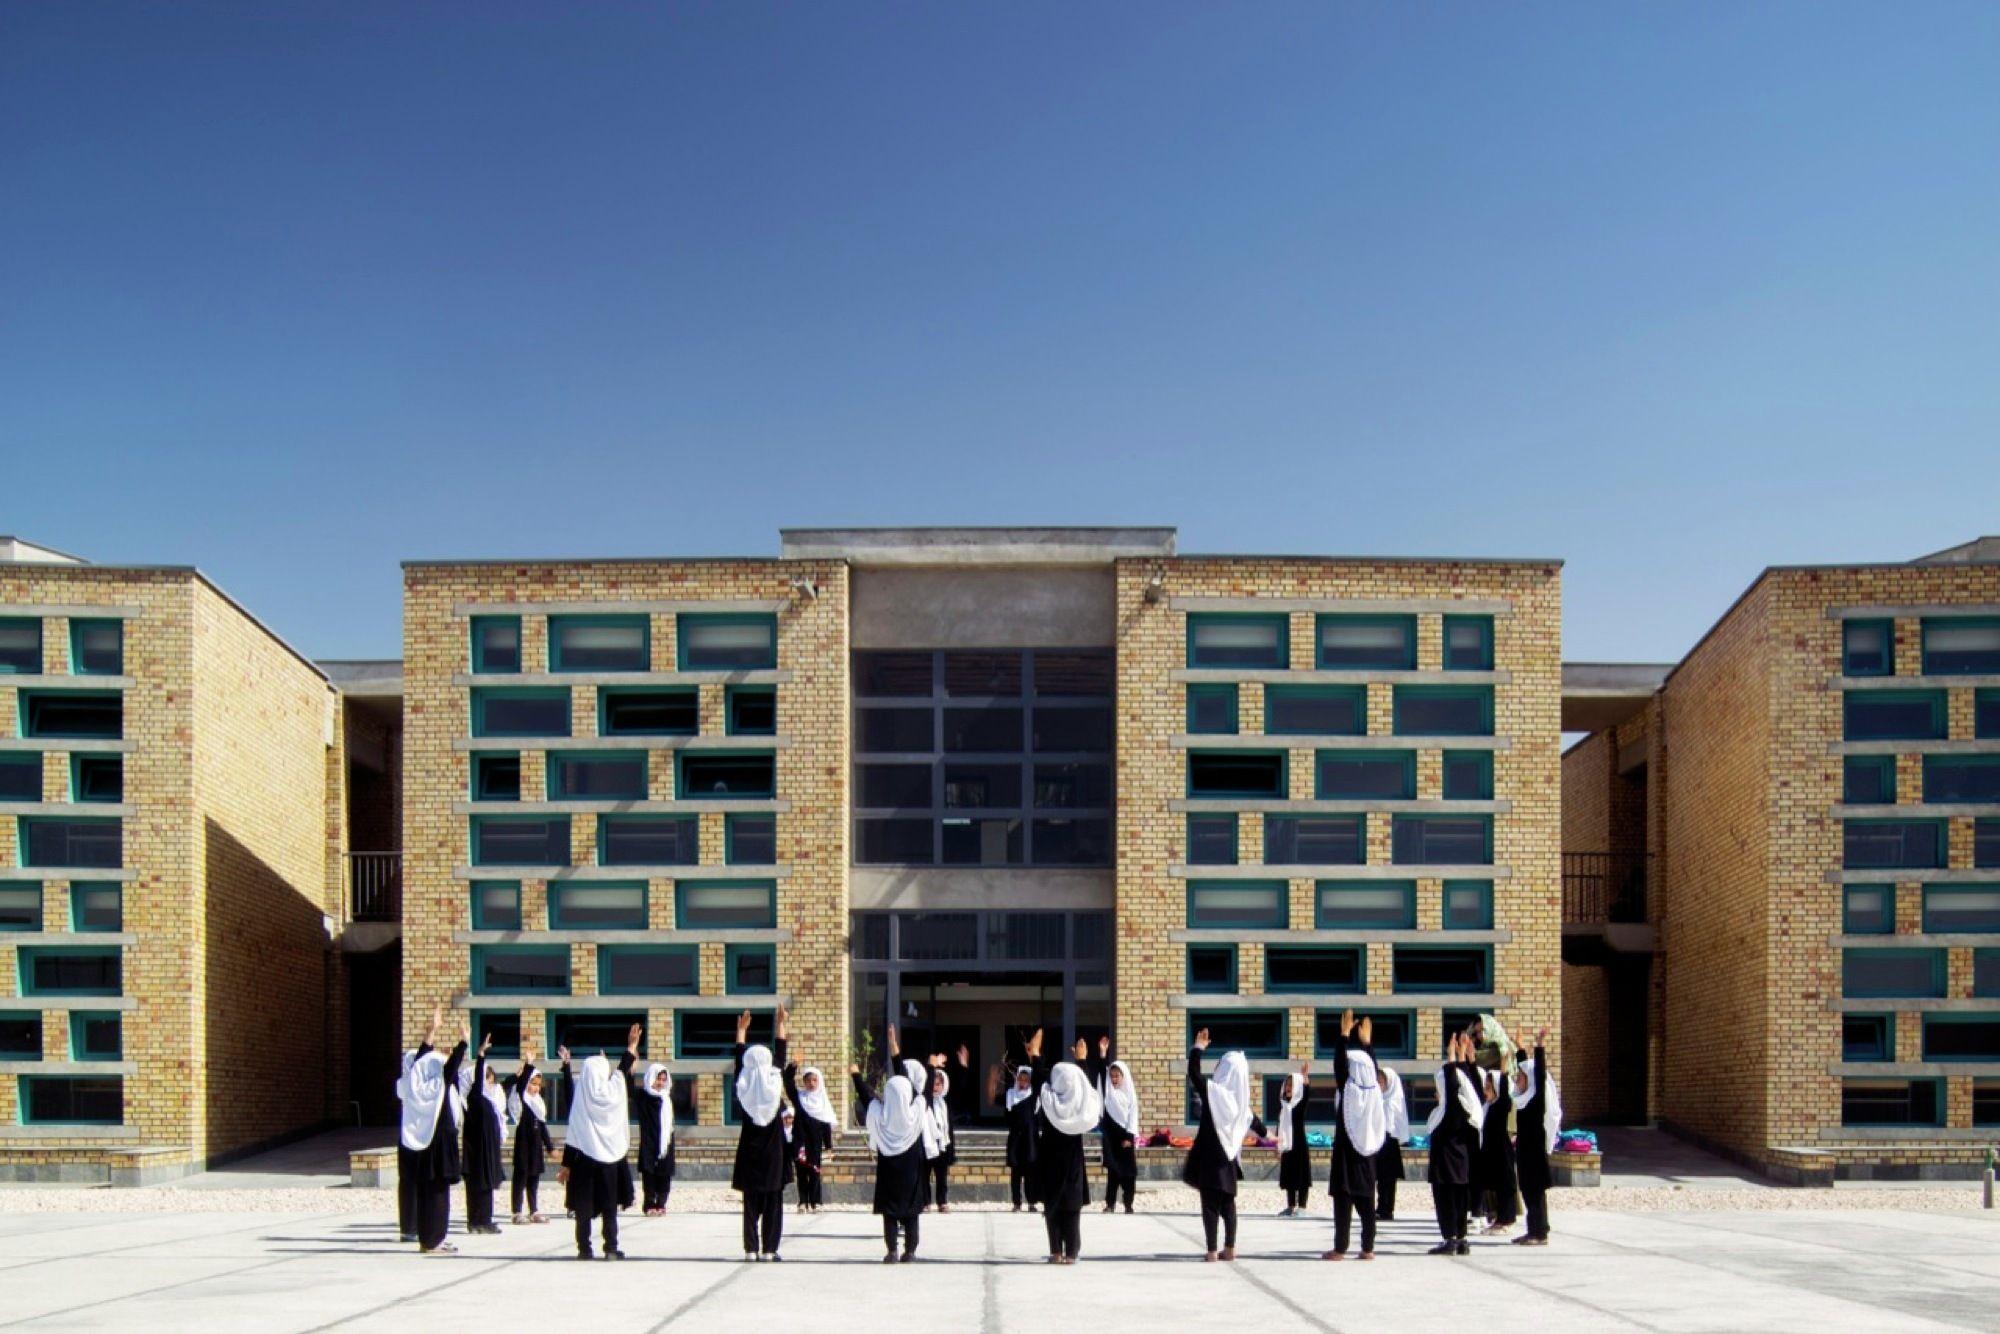 Gohar Khatoon Girls School Robert Hull University Of Washington Hull University University Of Washington Architecture Exterior